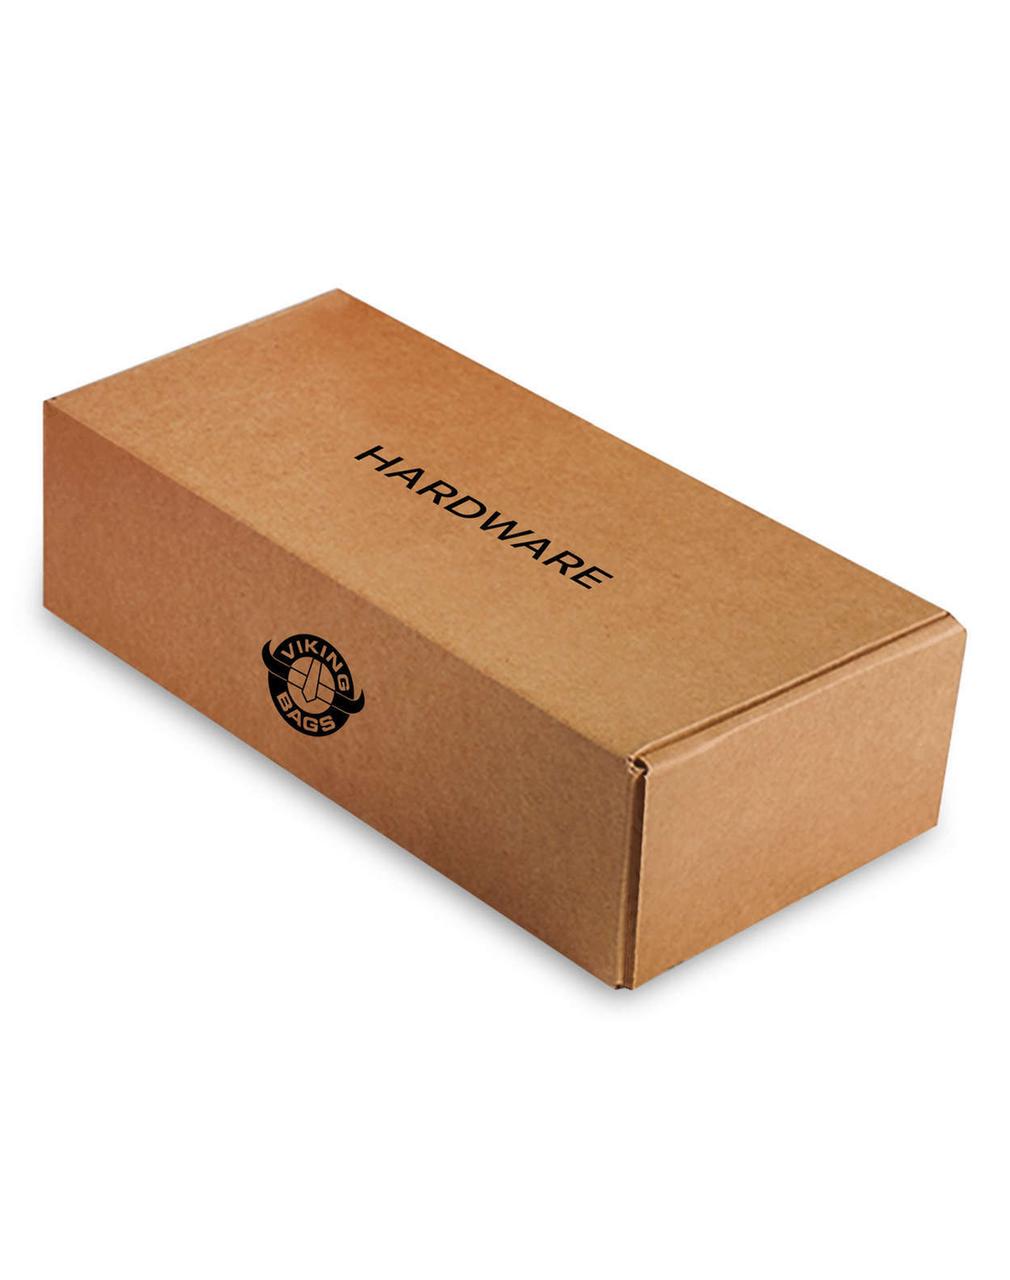 Indian Chief Standard Charger Single Strap Medium Motorcycle Saddlebags Box